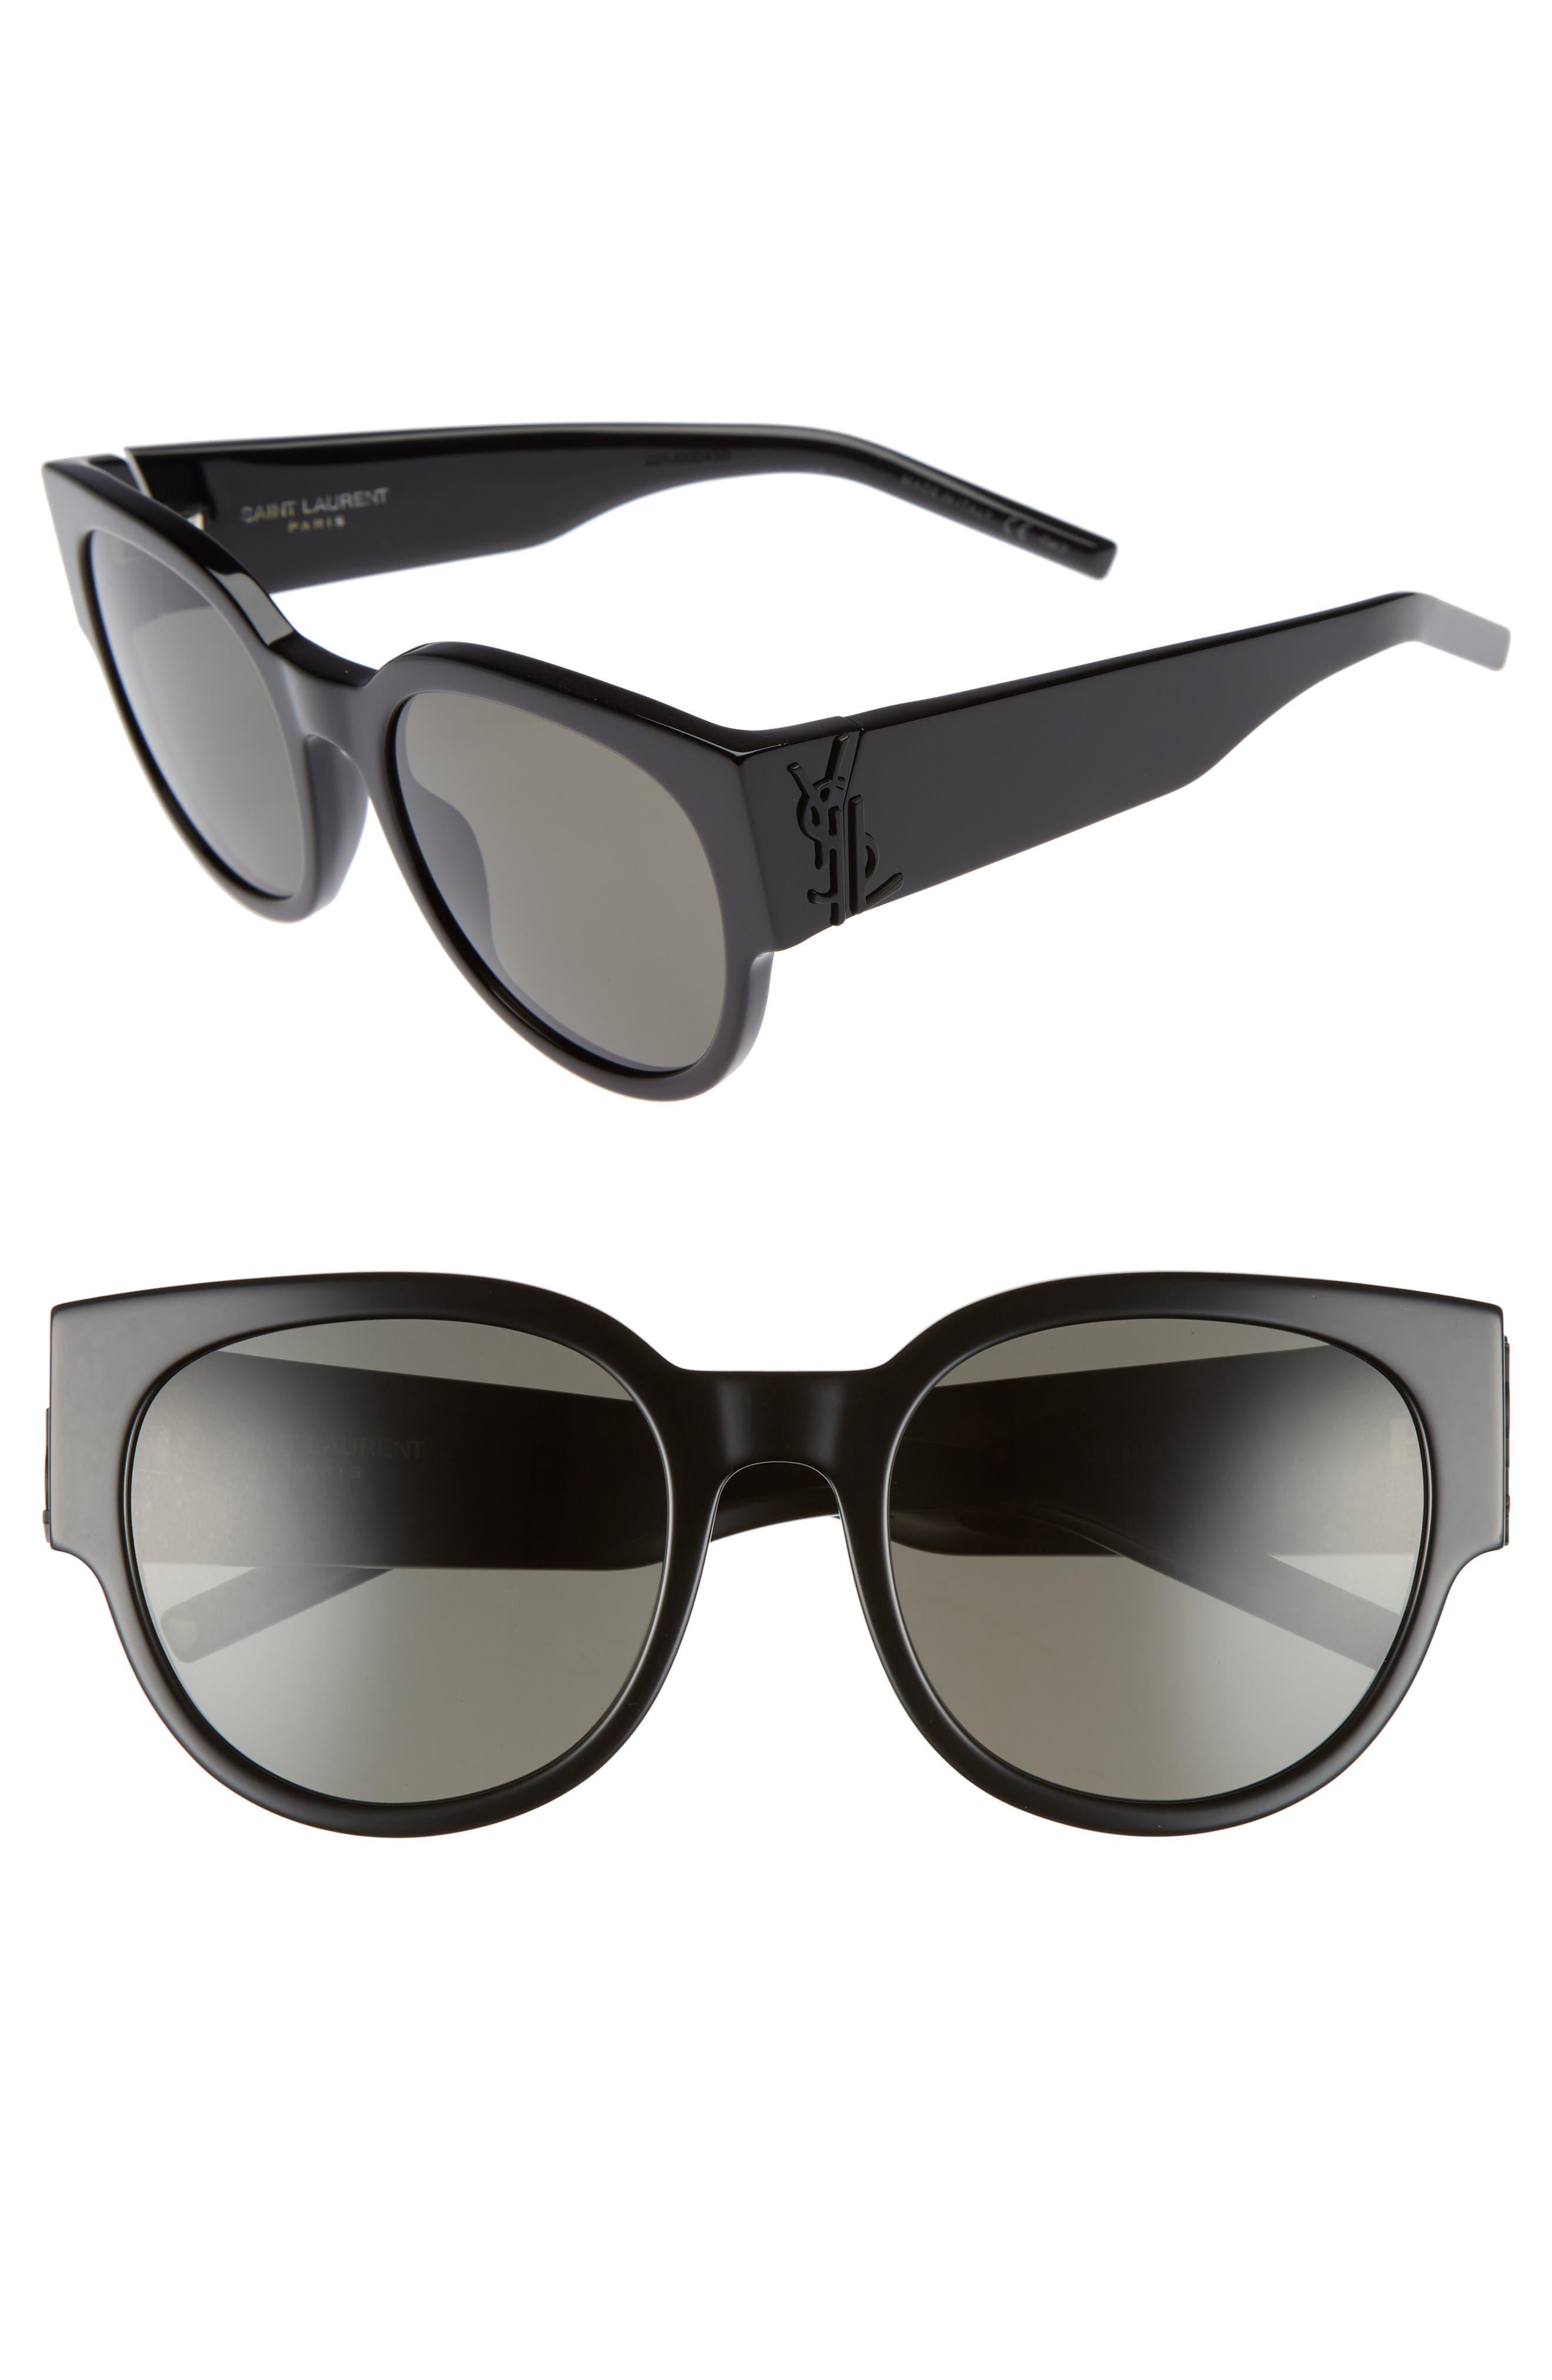 SL M19 54mm Cat Eye Sunglasses,                             Main thumbnail 1, color,                             BLACK